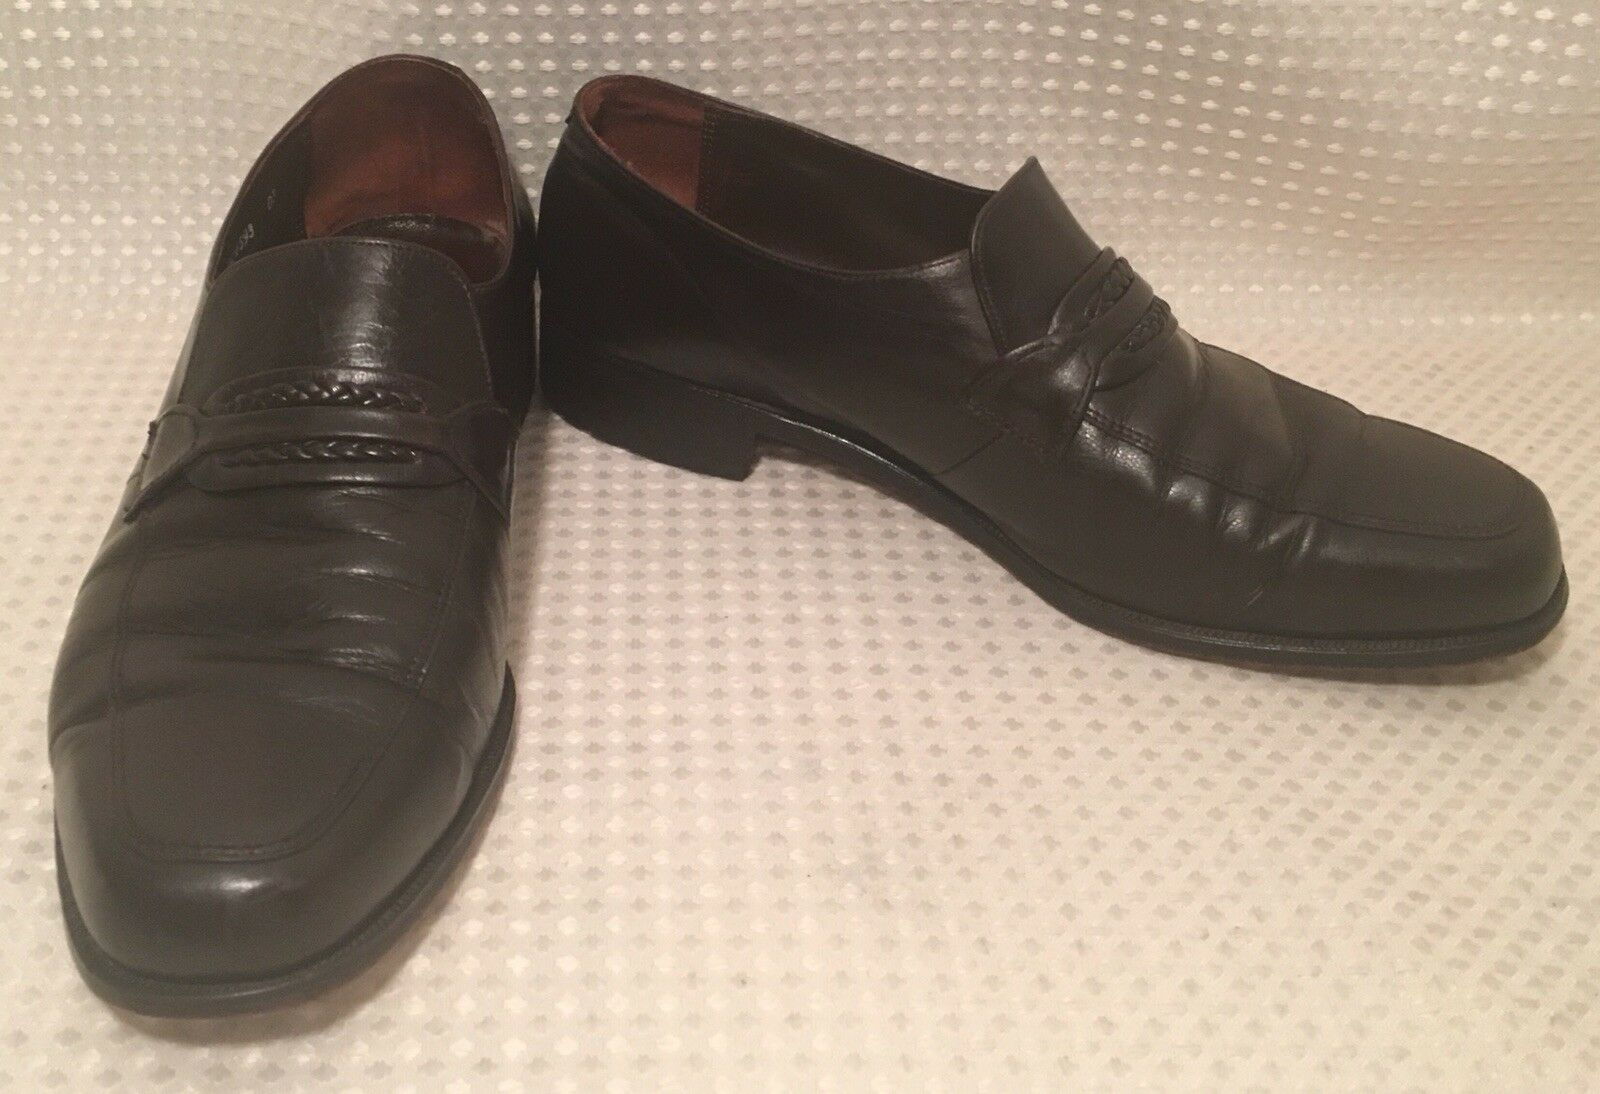 Florsheim Leather Loafers Men's Dress shoes Dark Brown Slip On Comfort Sz 10